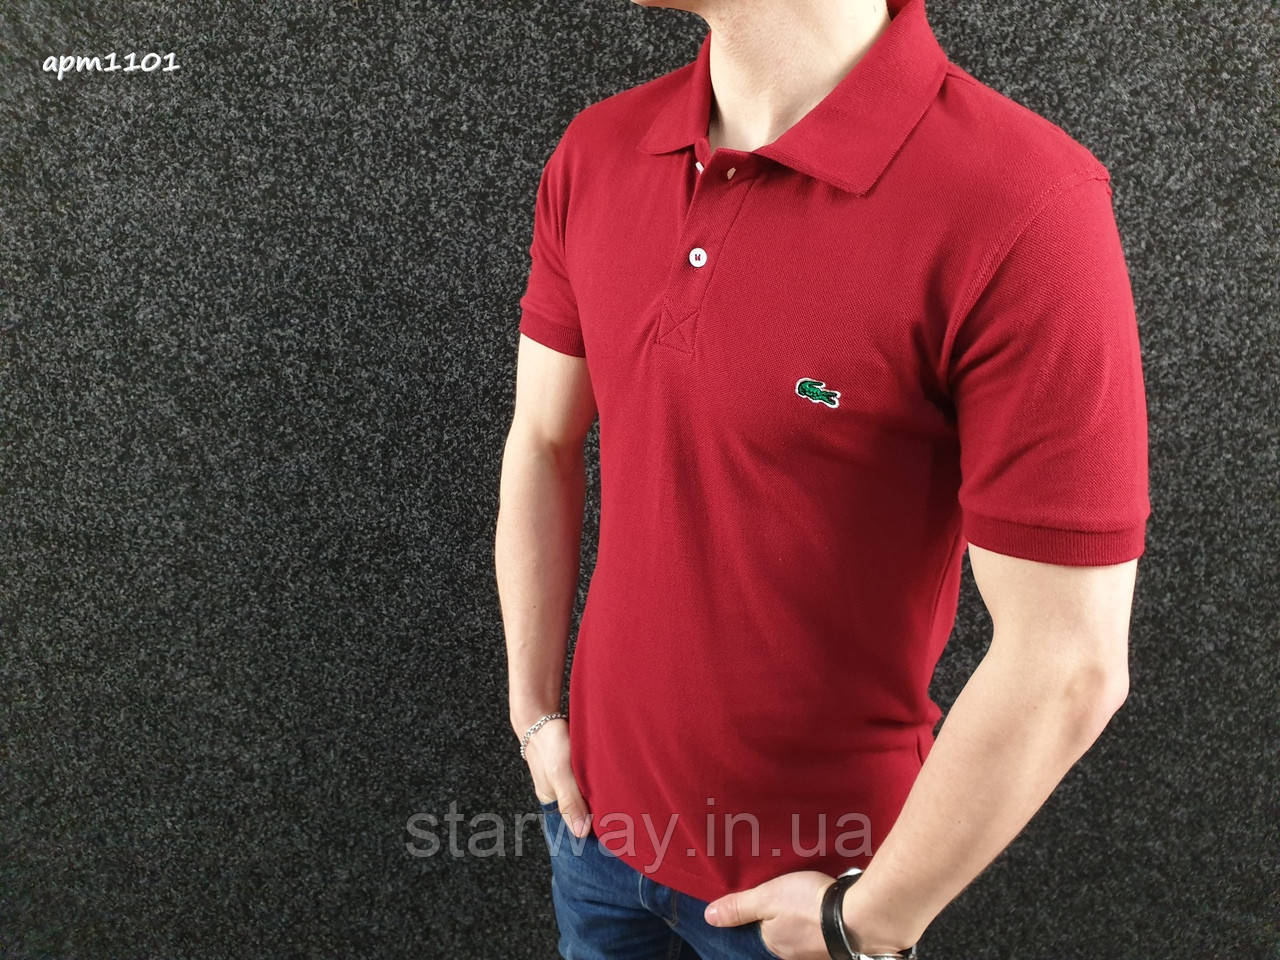 Футболка поло | бордовая тенниска Lacoste логотип вышивка | бирка